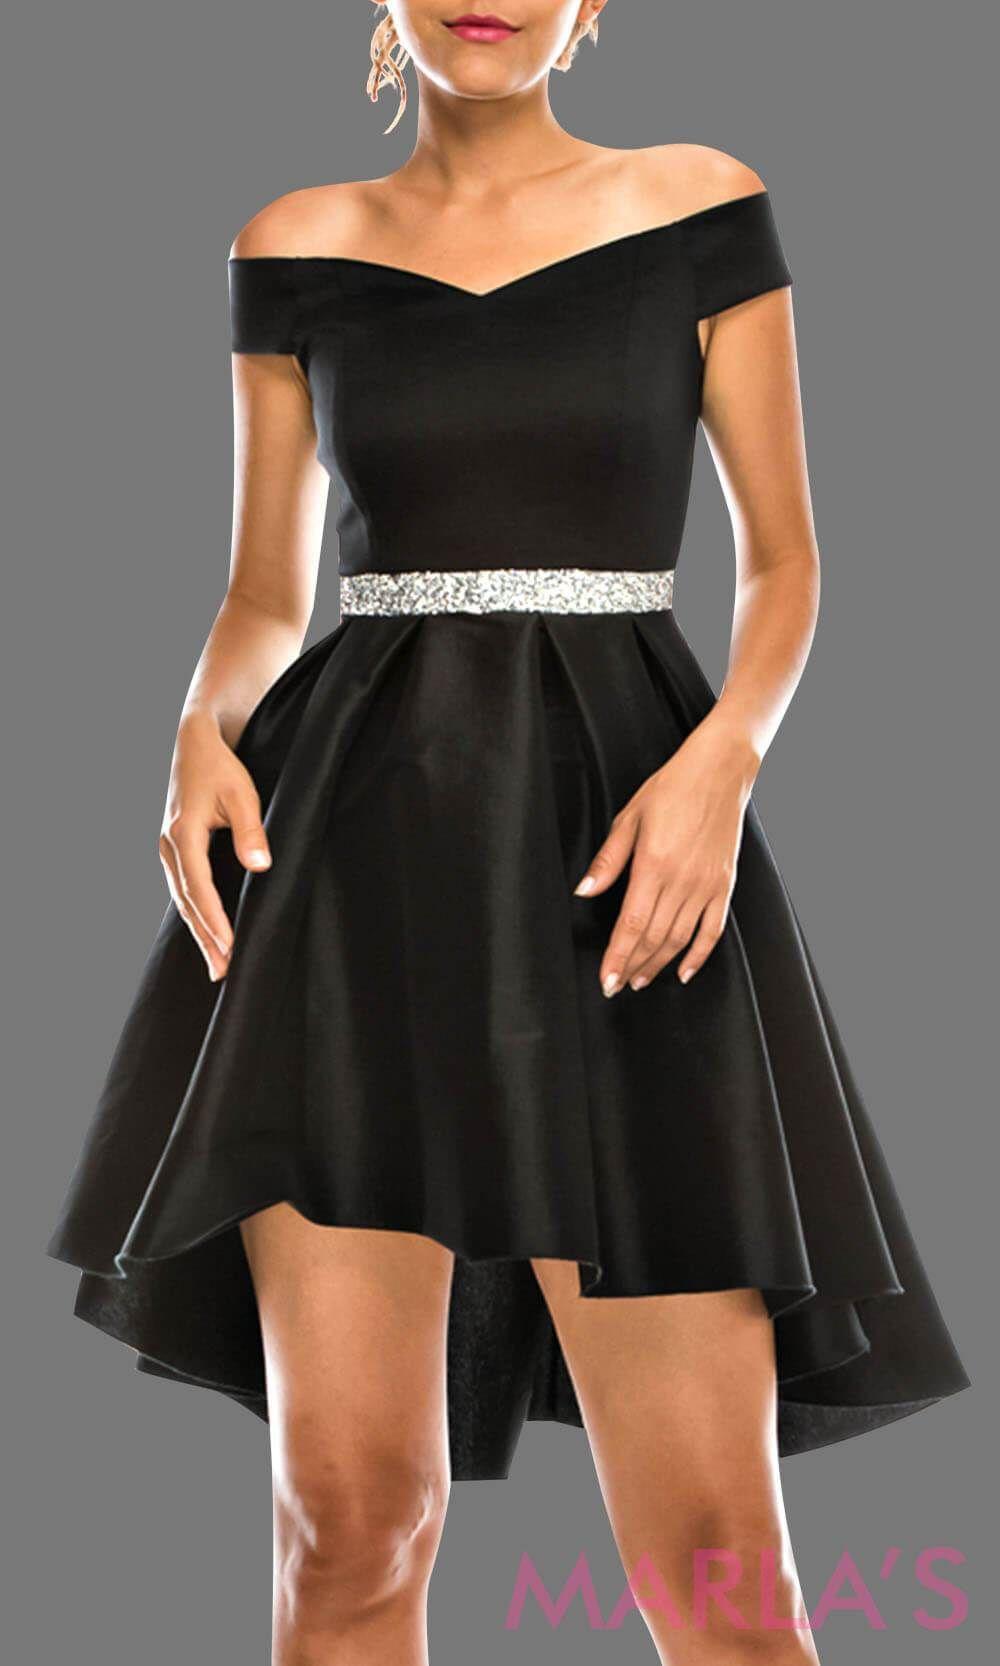 95a5997656 Simple high low black off shoulder grade 8 grad taffeta dress with  rhinestone belt. Perfect black graduation dress